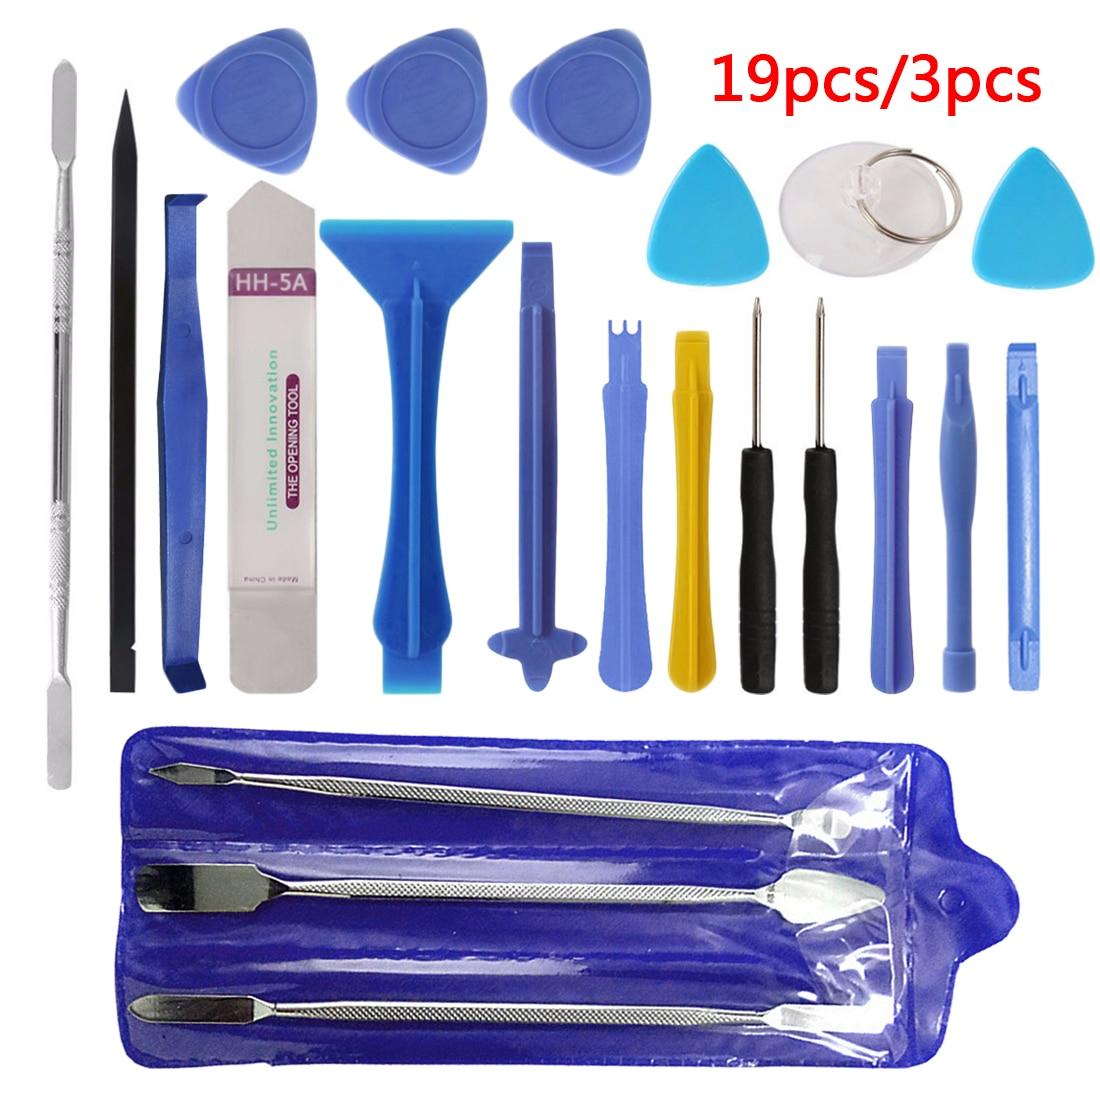 Hand Tool Set 3pcs/19pcs Repair Tool Kit Opening Tool Metal Pry Bar Smartphone Screen Disassemble Tools for iPhone Tablet PC